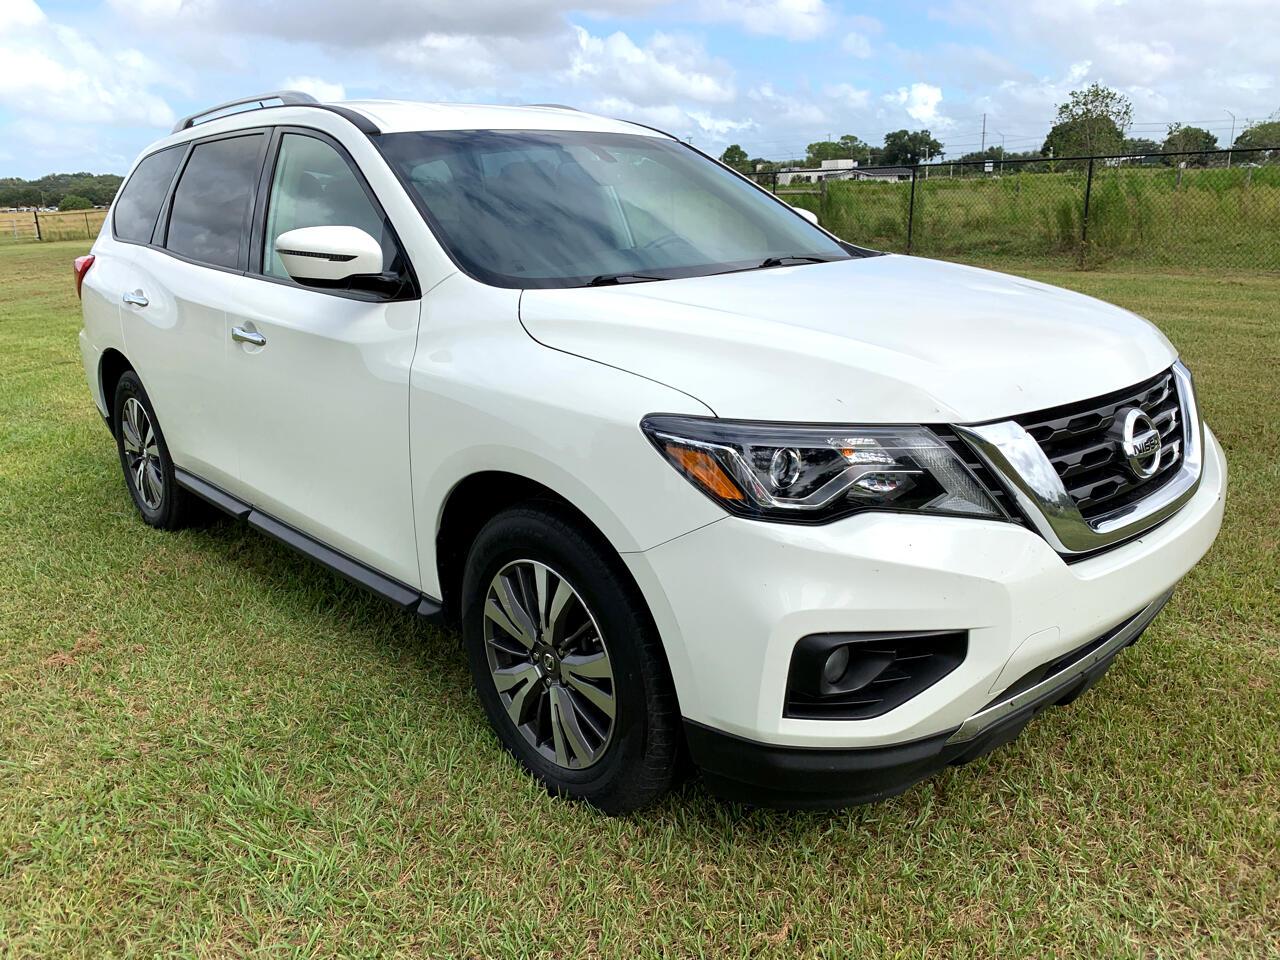 2017 Nissan Pathfinder 4x4 SV